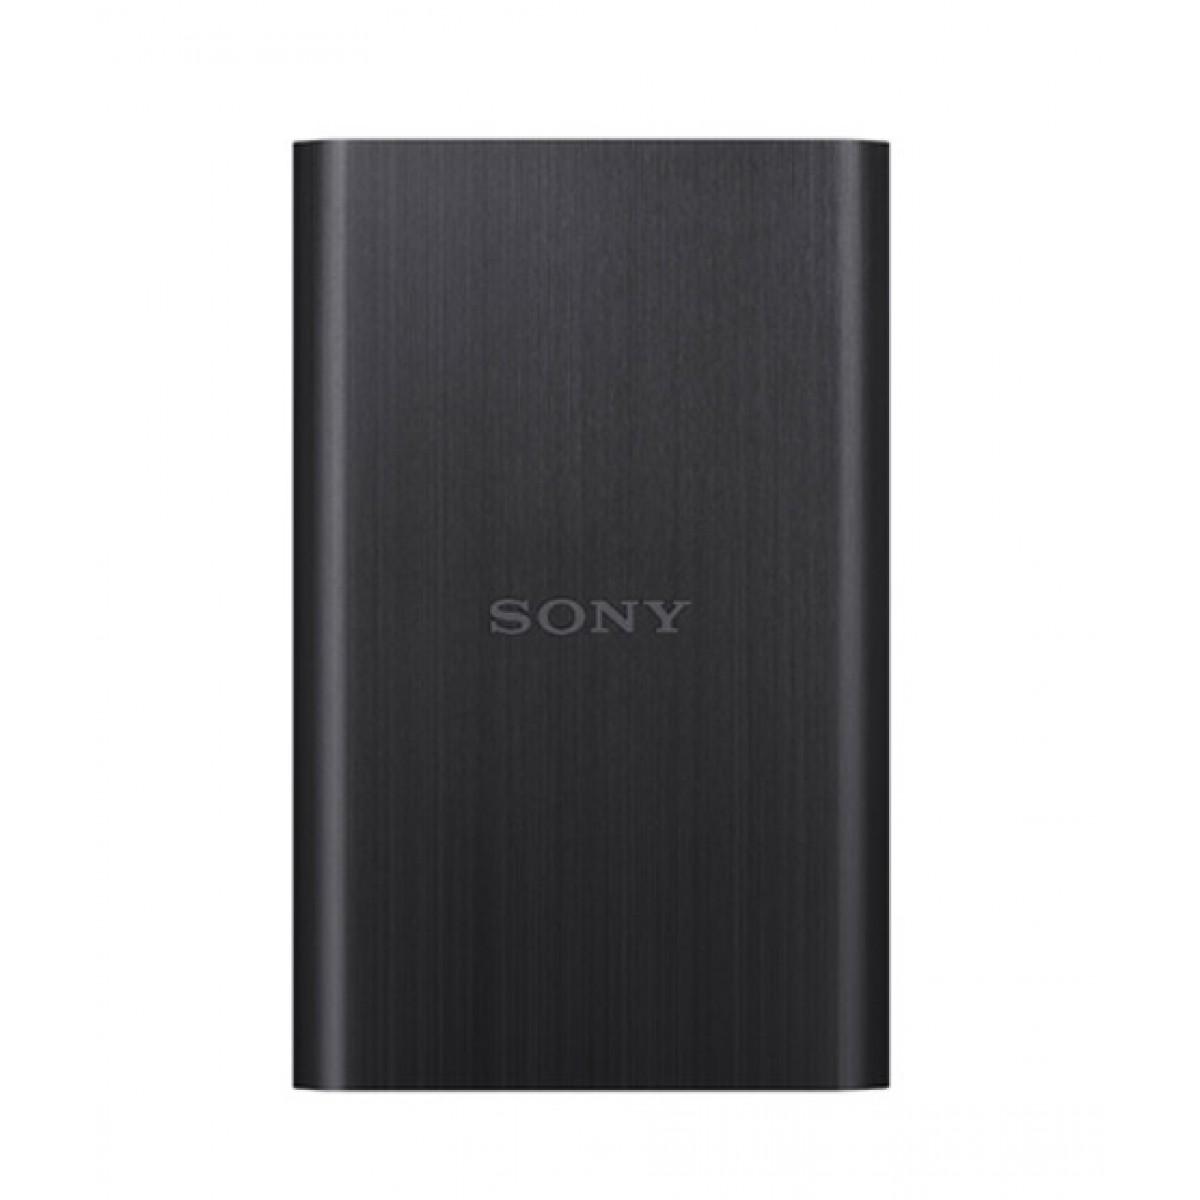 Sony 500GB Standard External Hard Drive (HD-EG5)